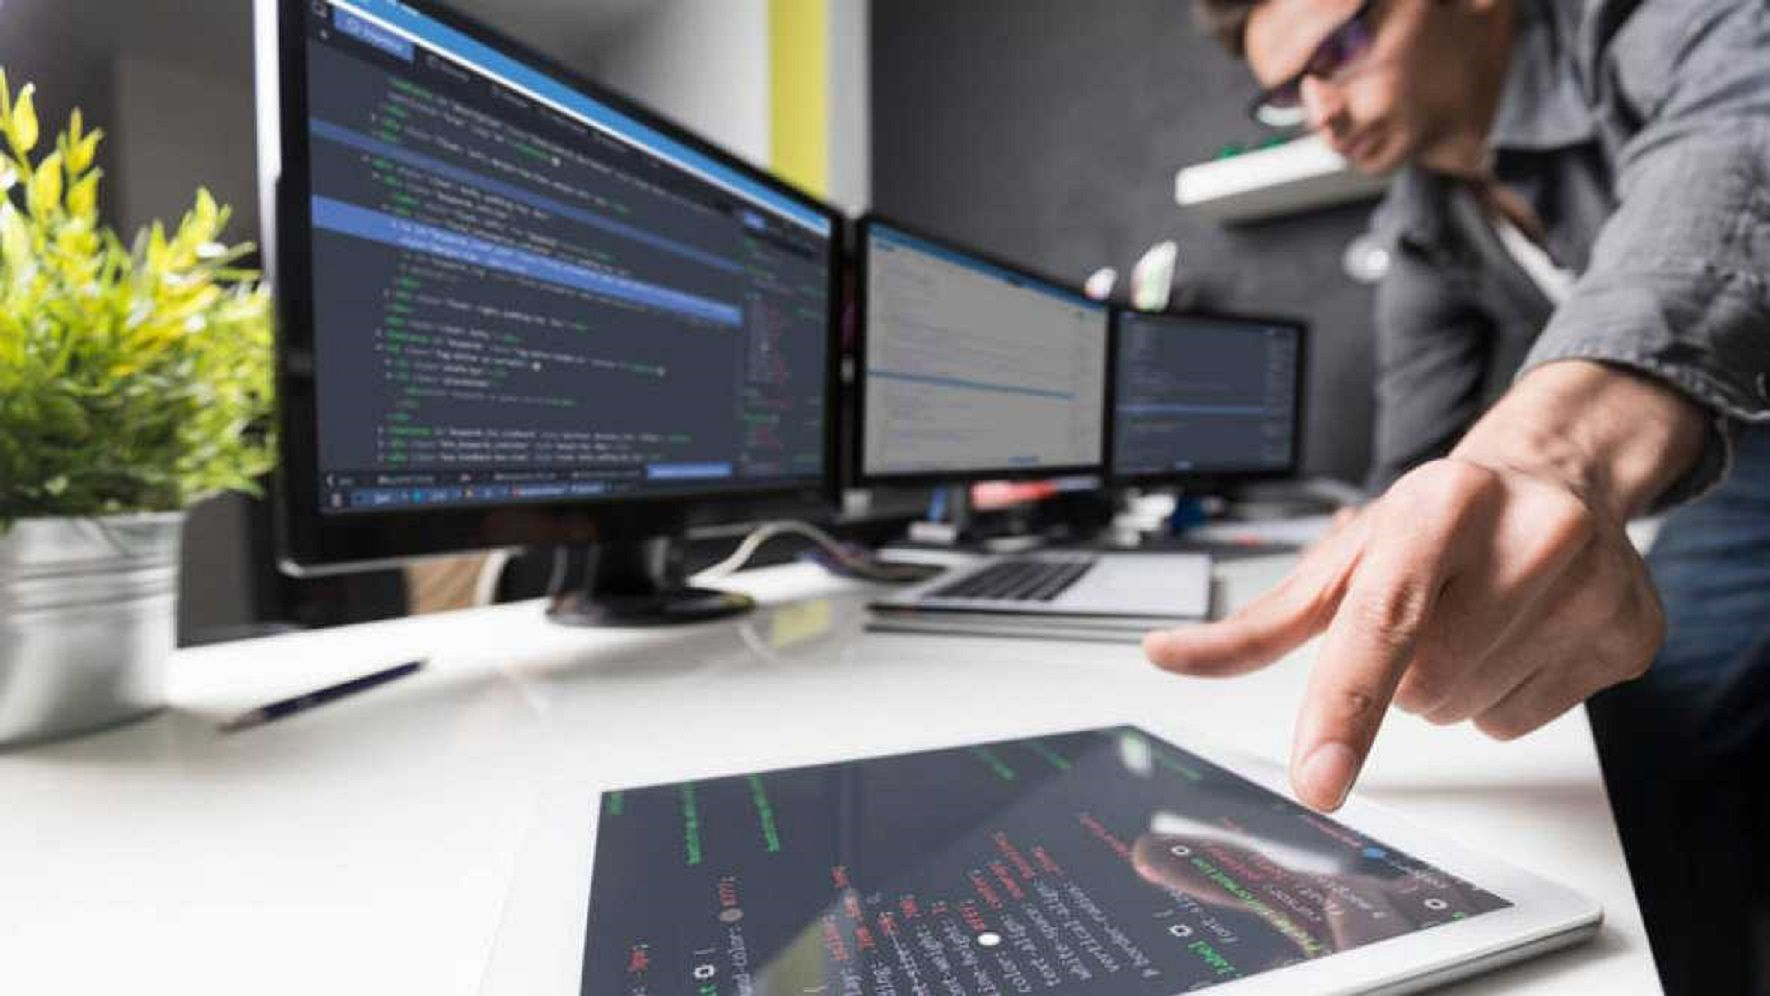 El ciberataque masivo afectó a instituciones de todo el mundo